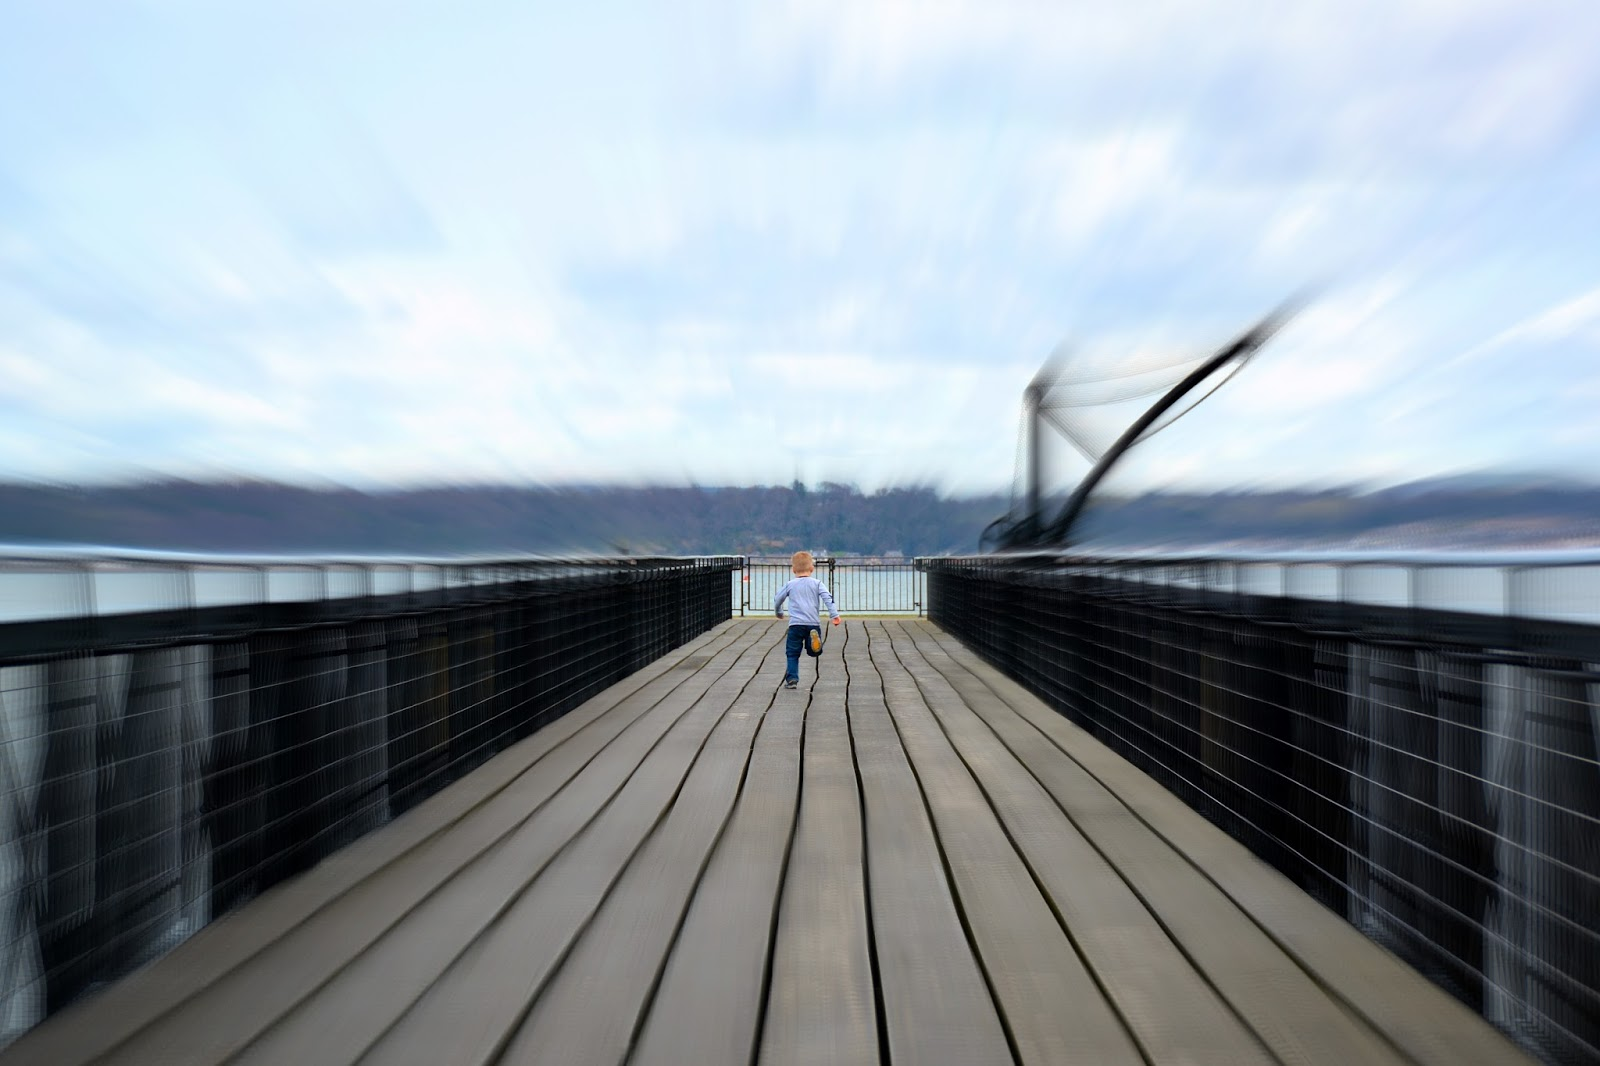 Jackson running down the dock